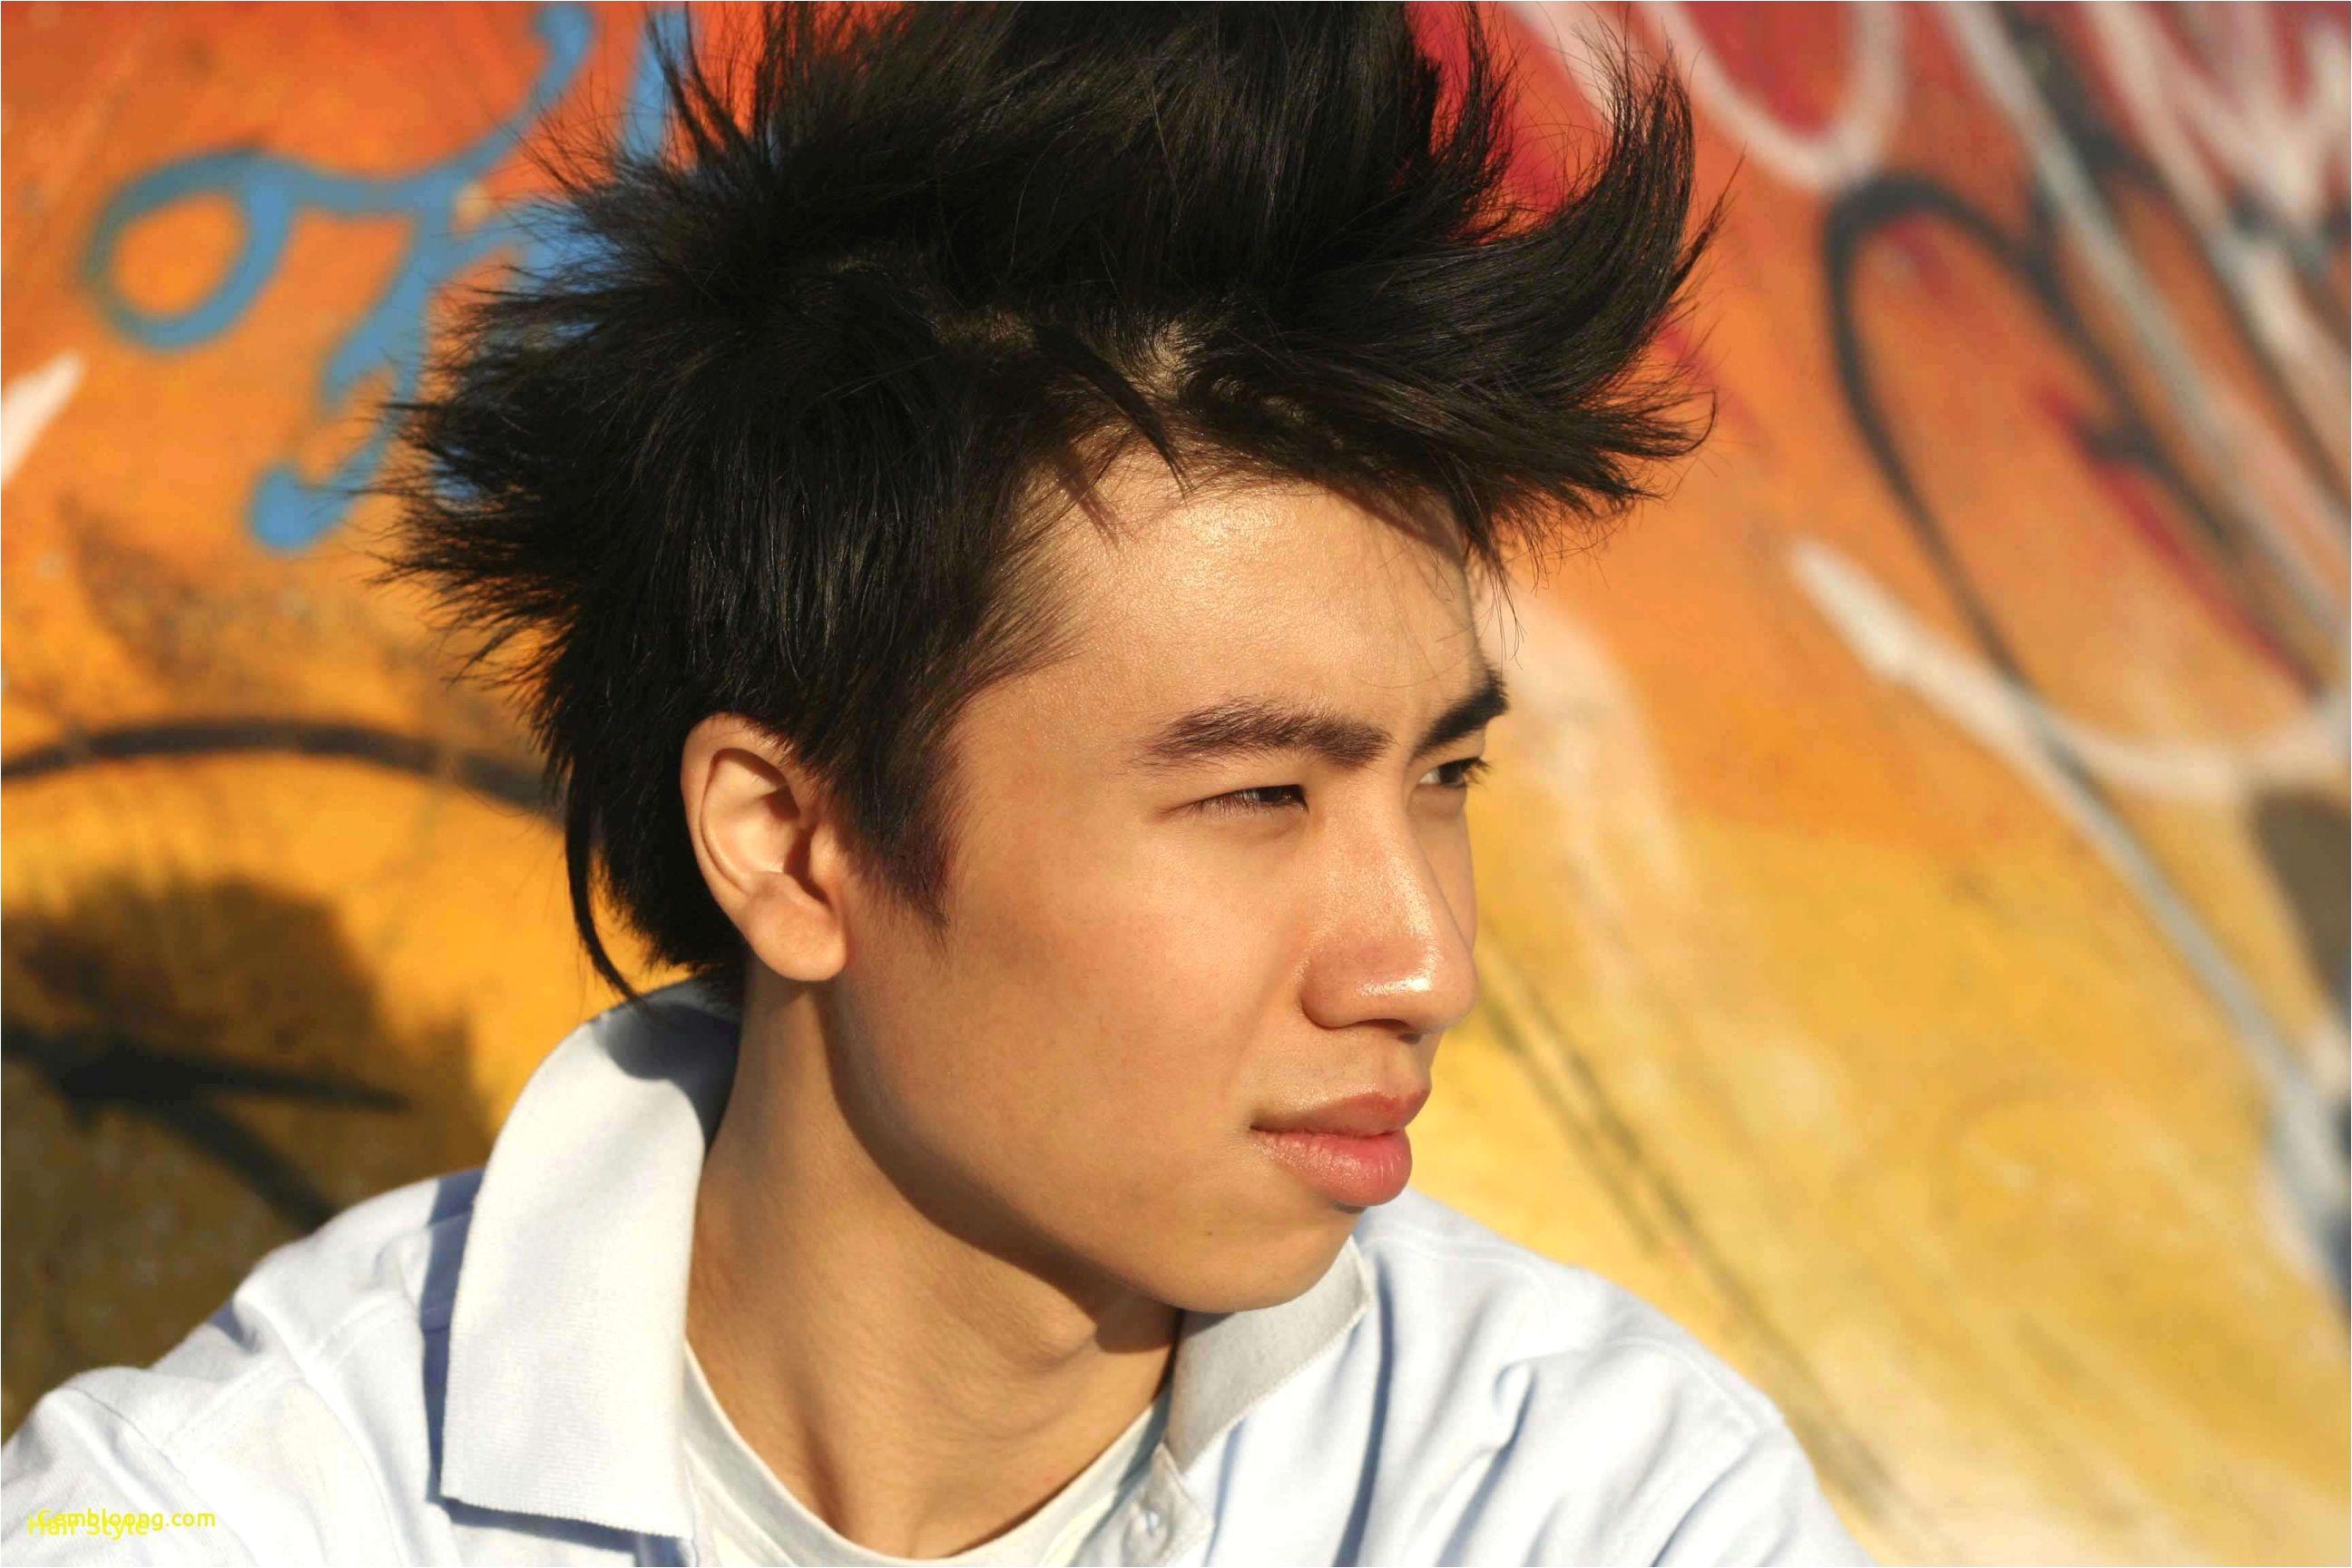 baby boy short hairstyles new black straight hairstyles good hairstyles for men luxury haircuts 0d